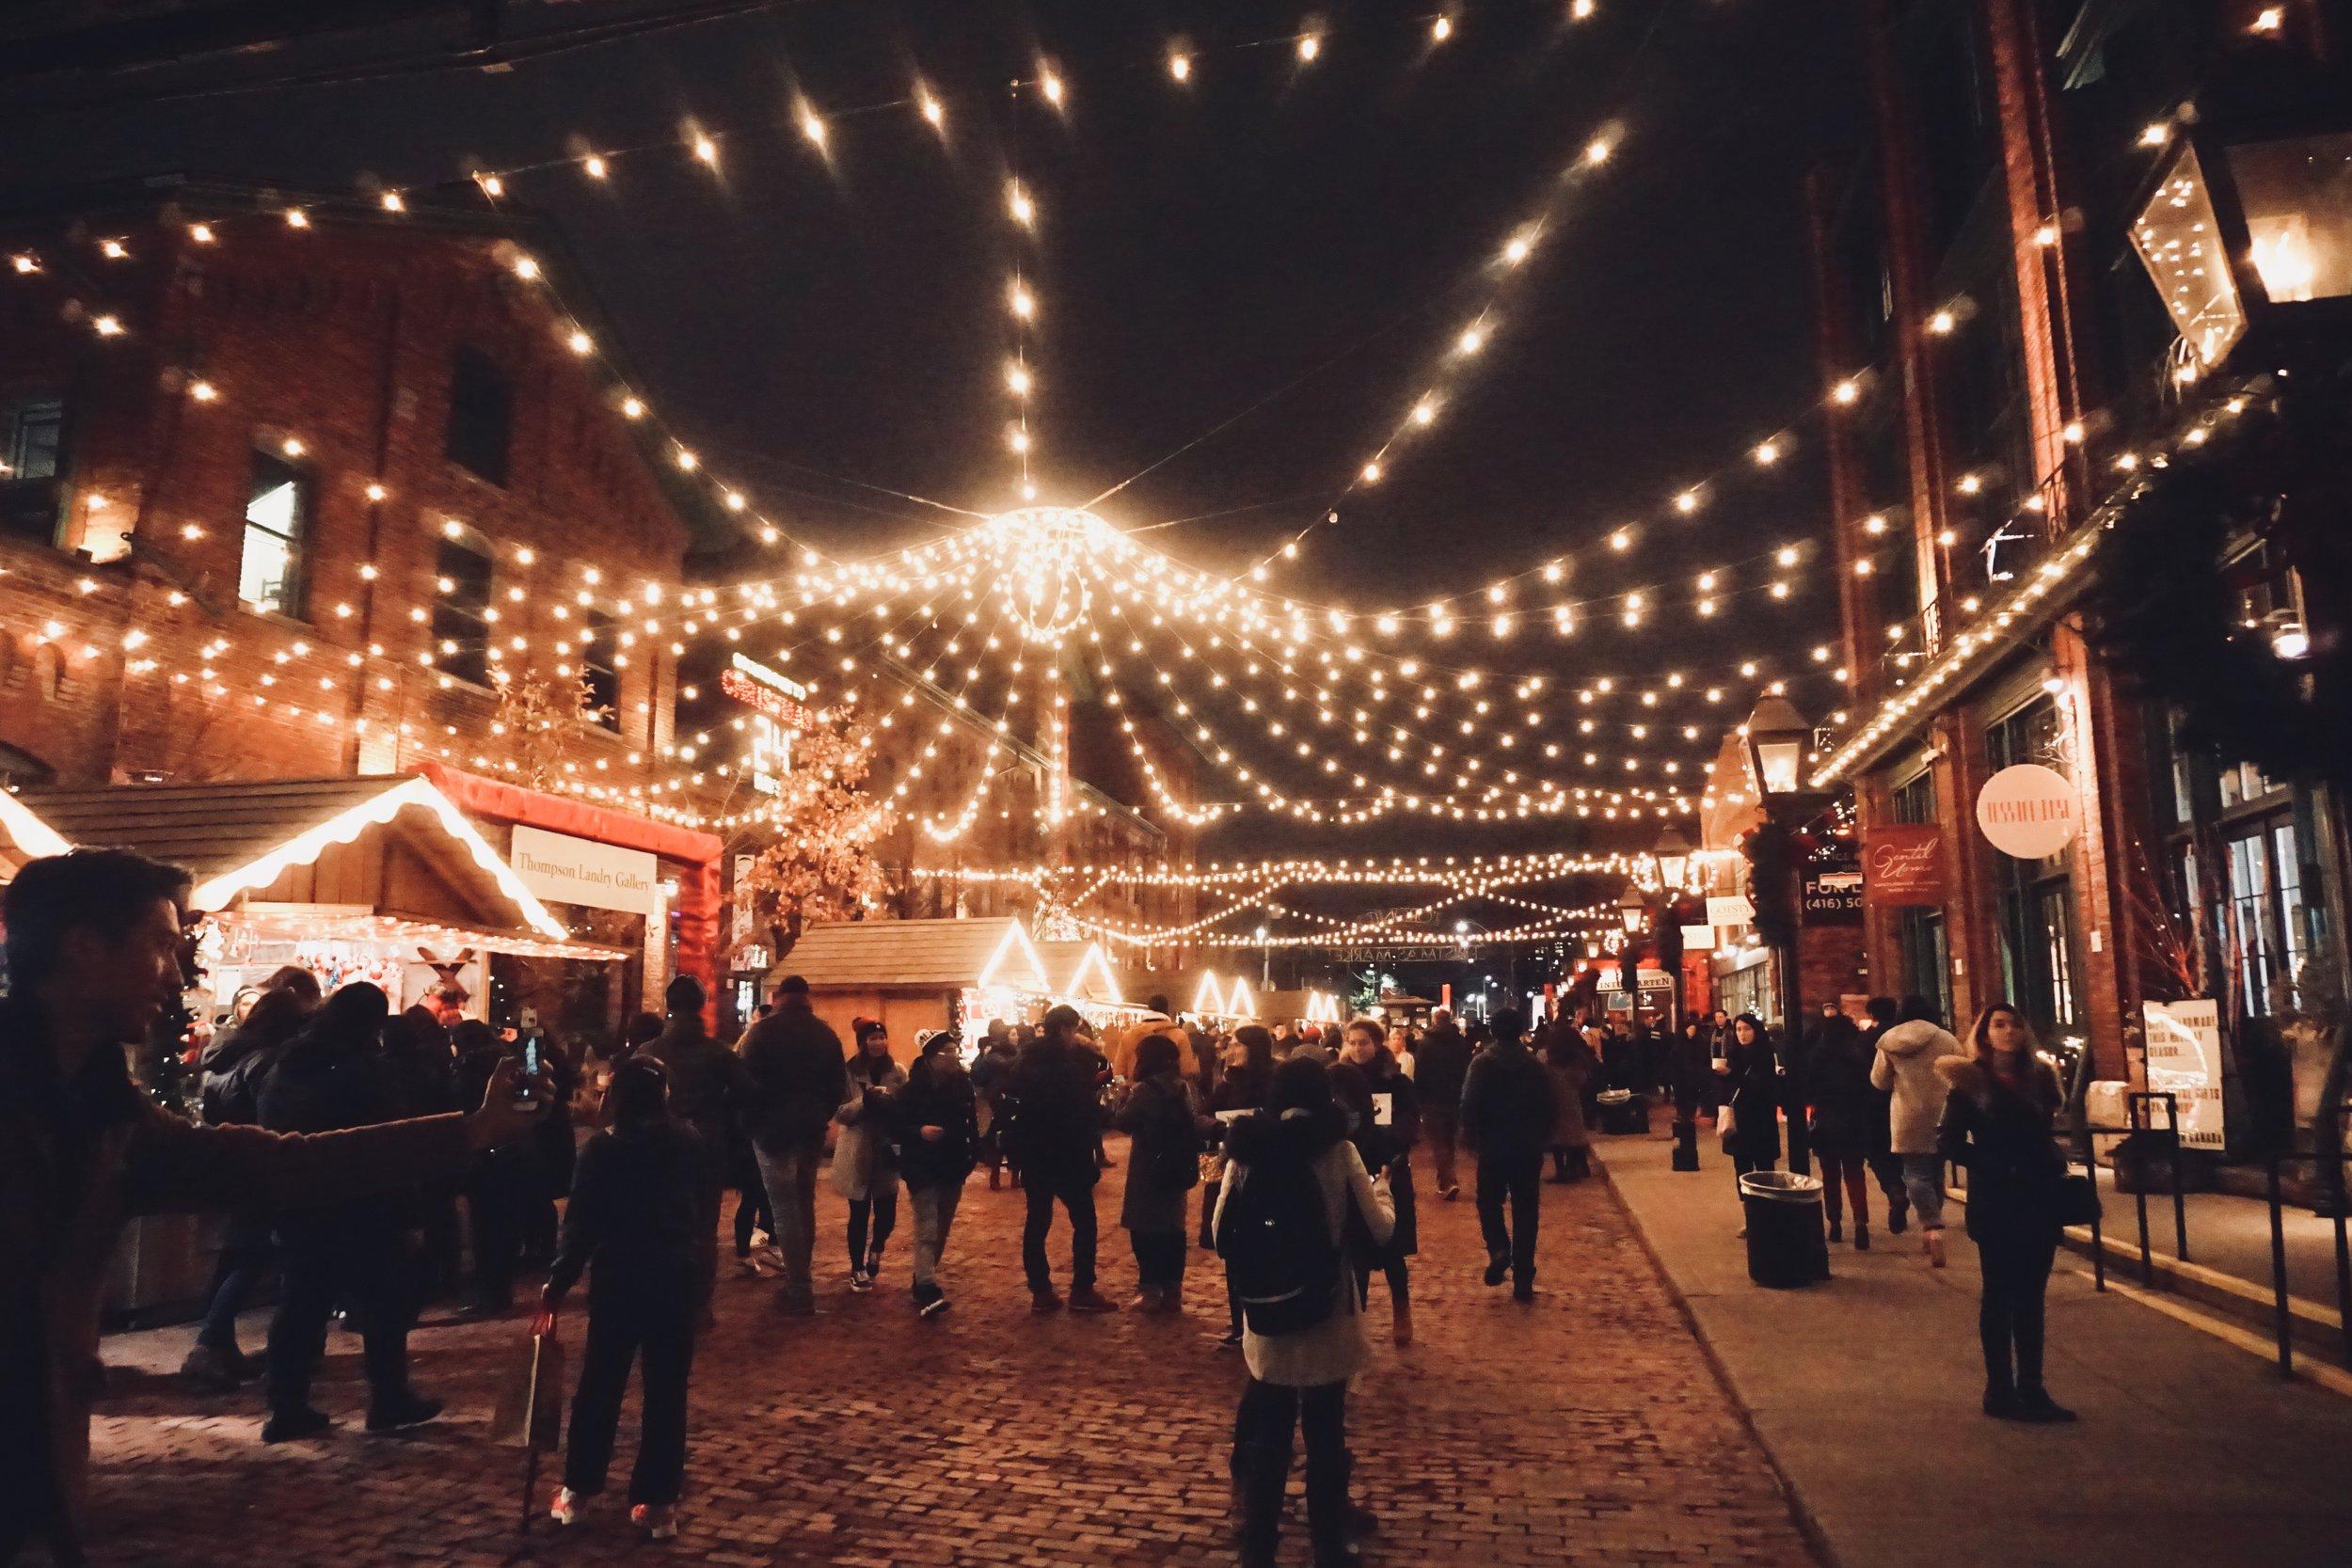 lit up marketplace at night